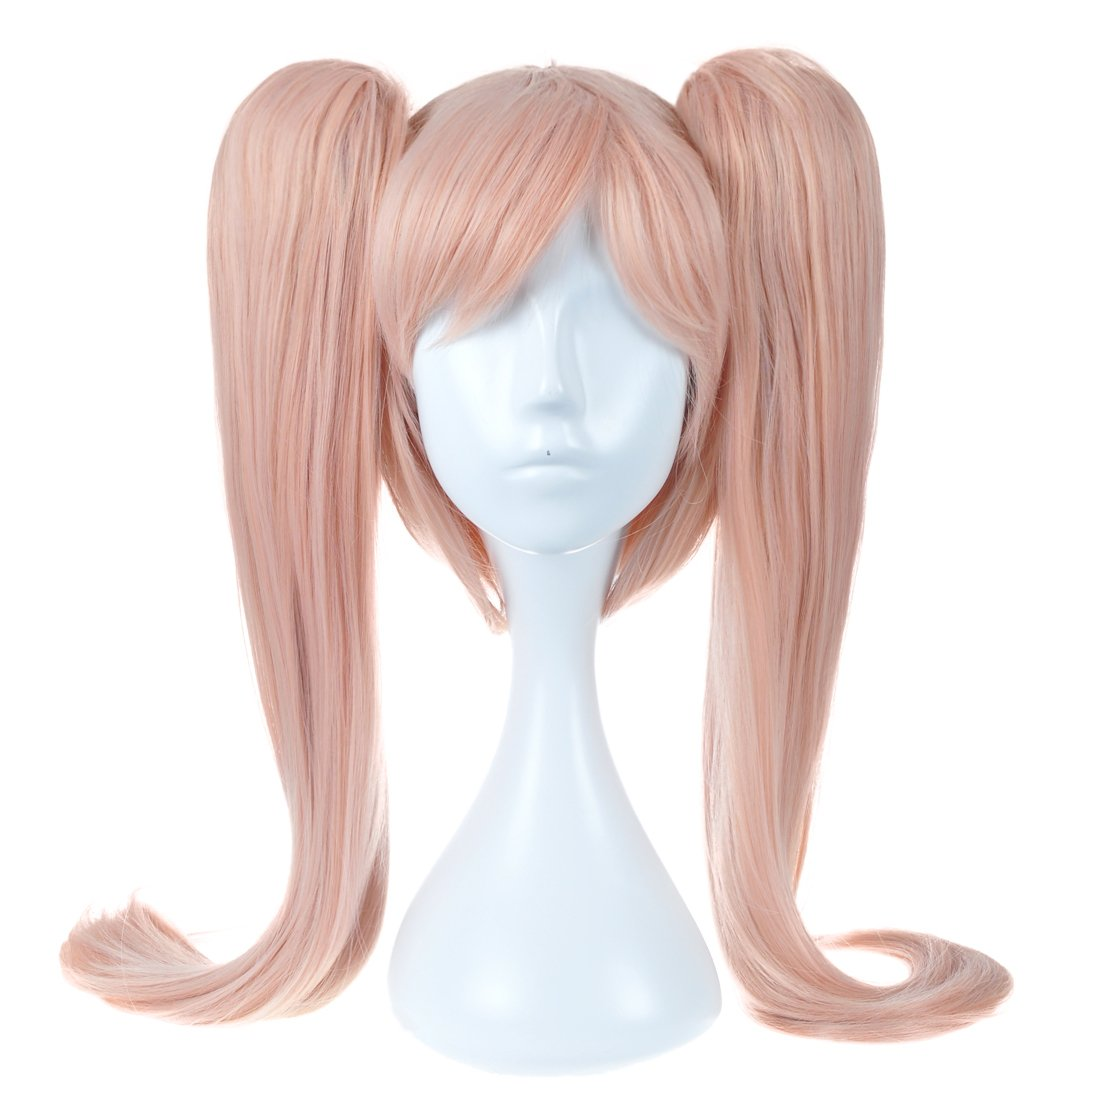 Monokuma Junko Enoshima hair clips CoolChange Dangan Ronpa